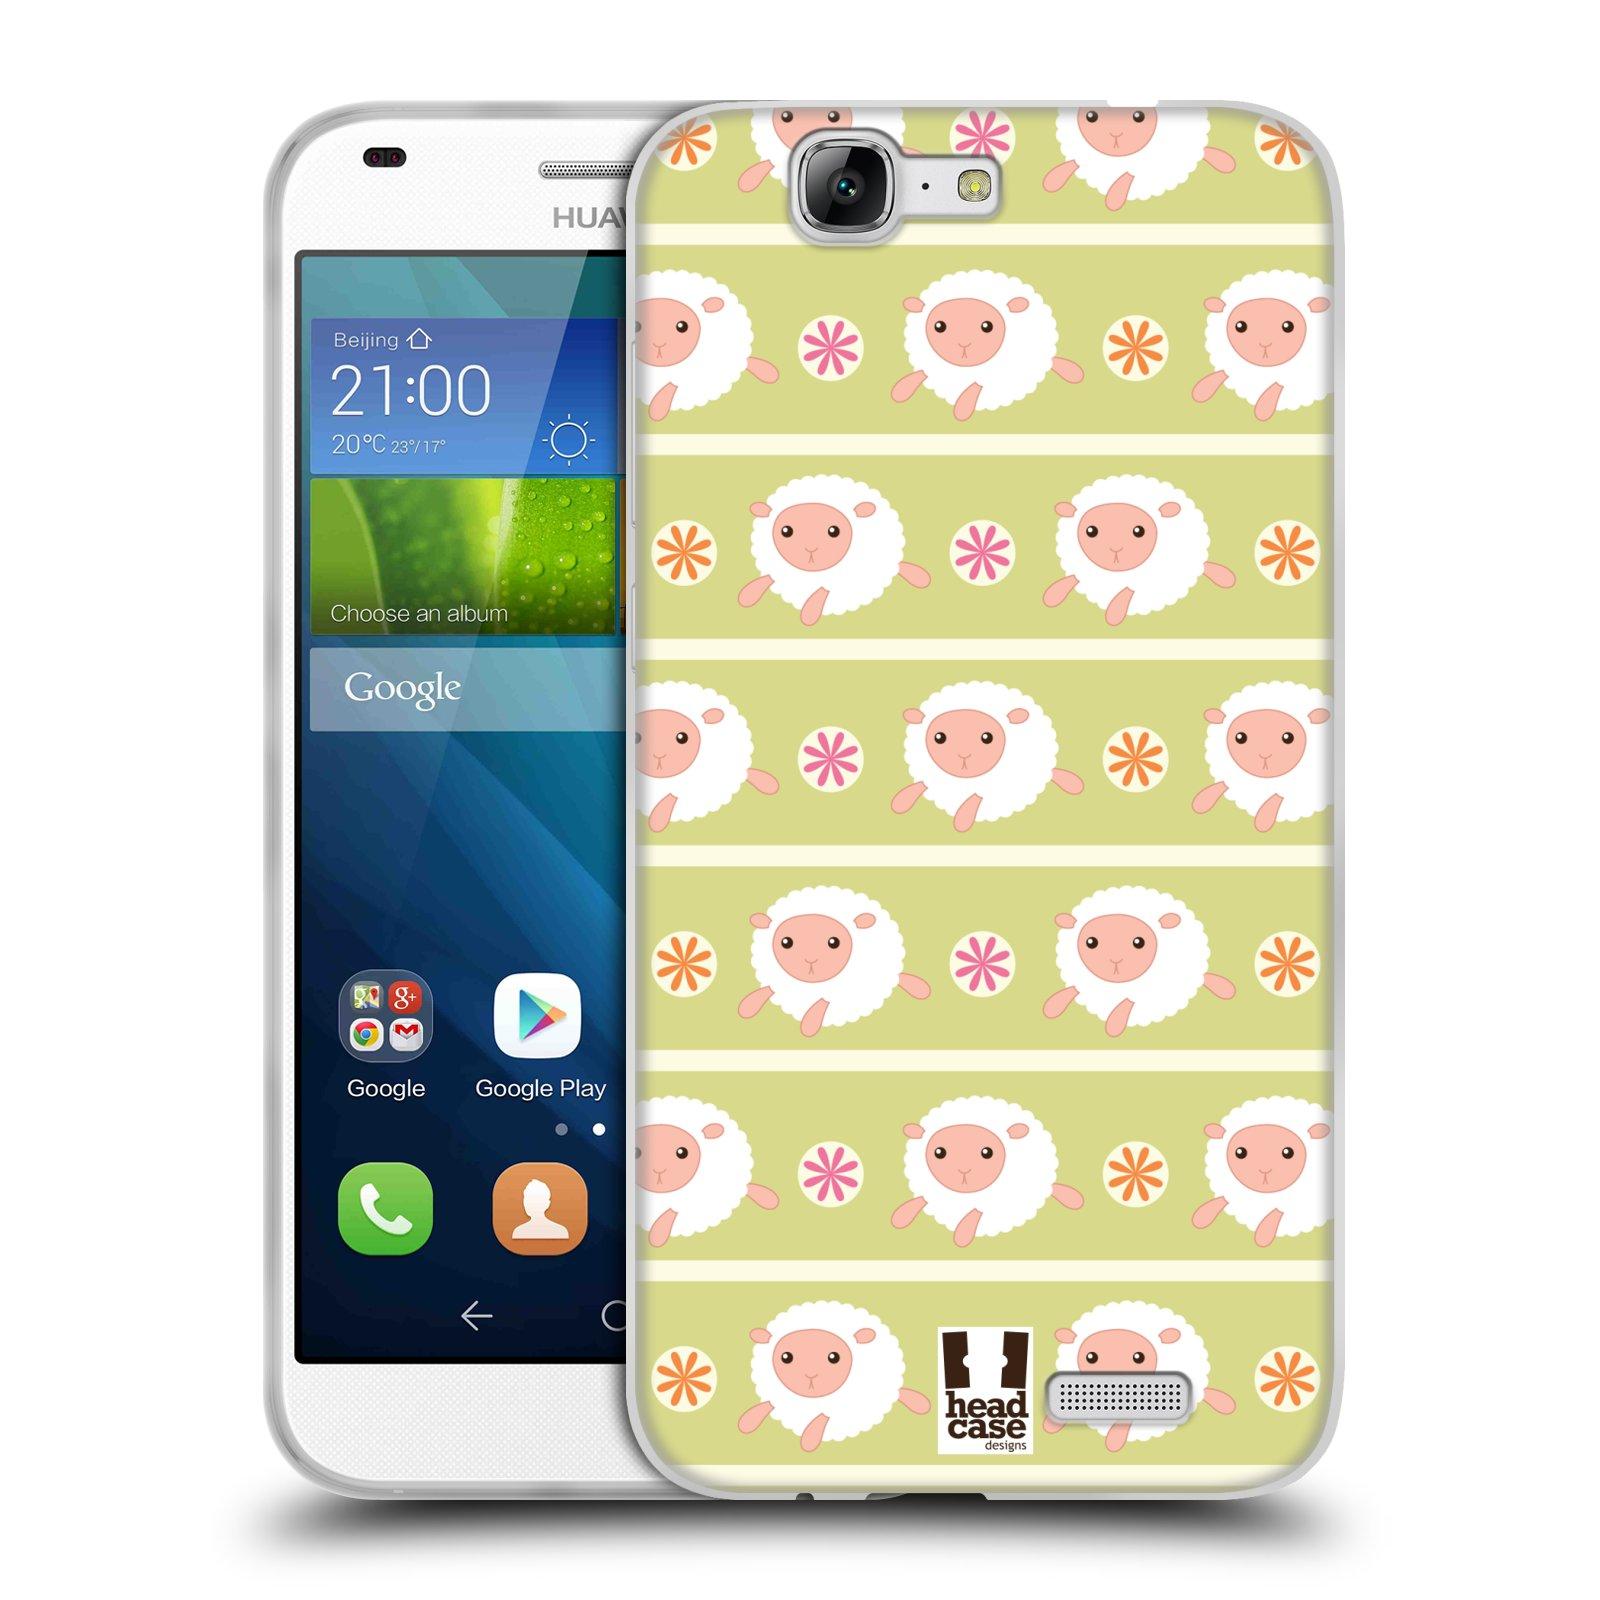 HEAD CASE silikonový obal na mobil HUAWEI Ascend G7 vzor roztomilé zvířecí vzory ovečky